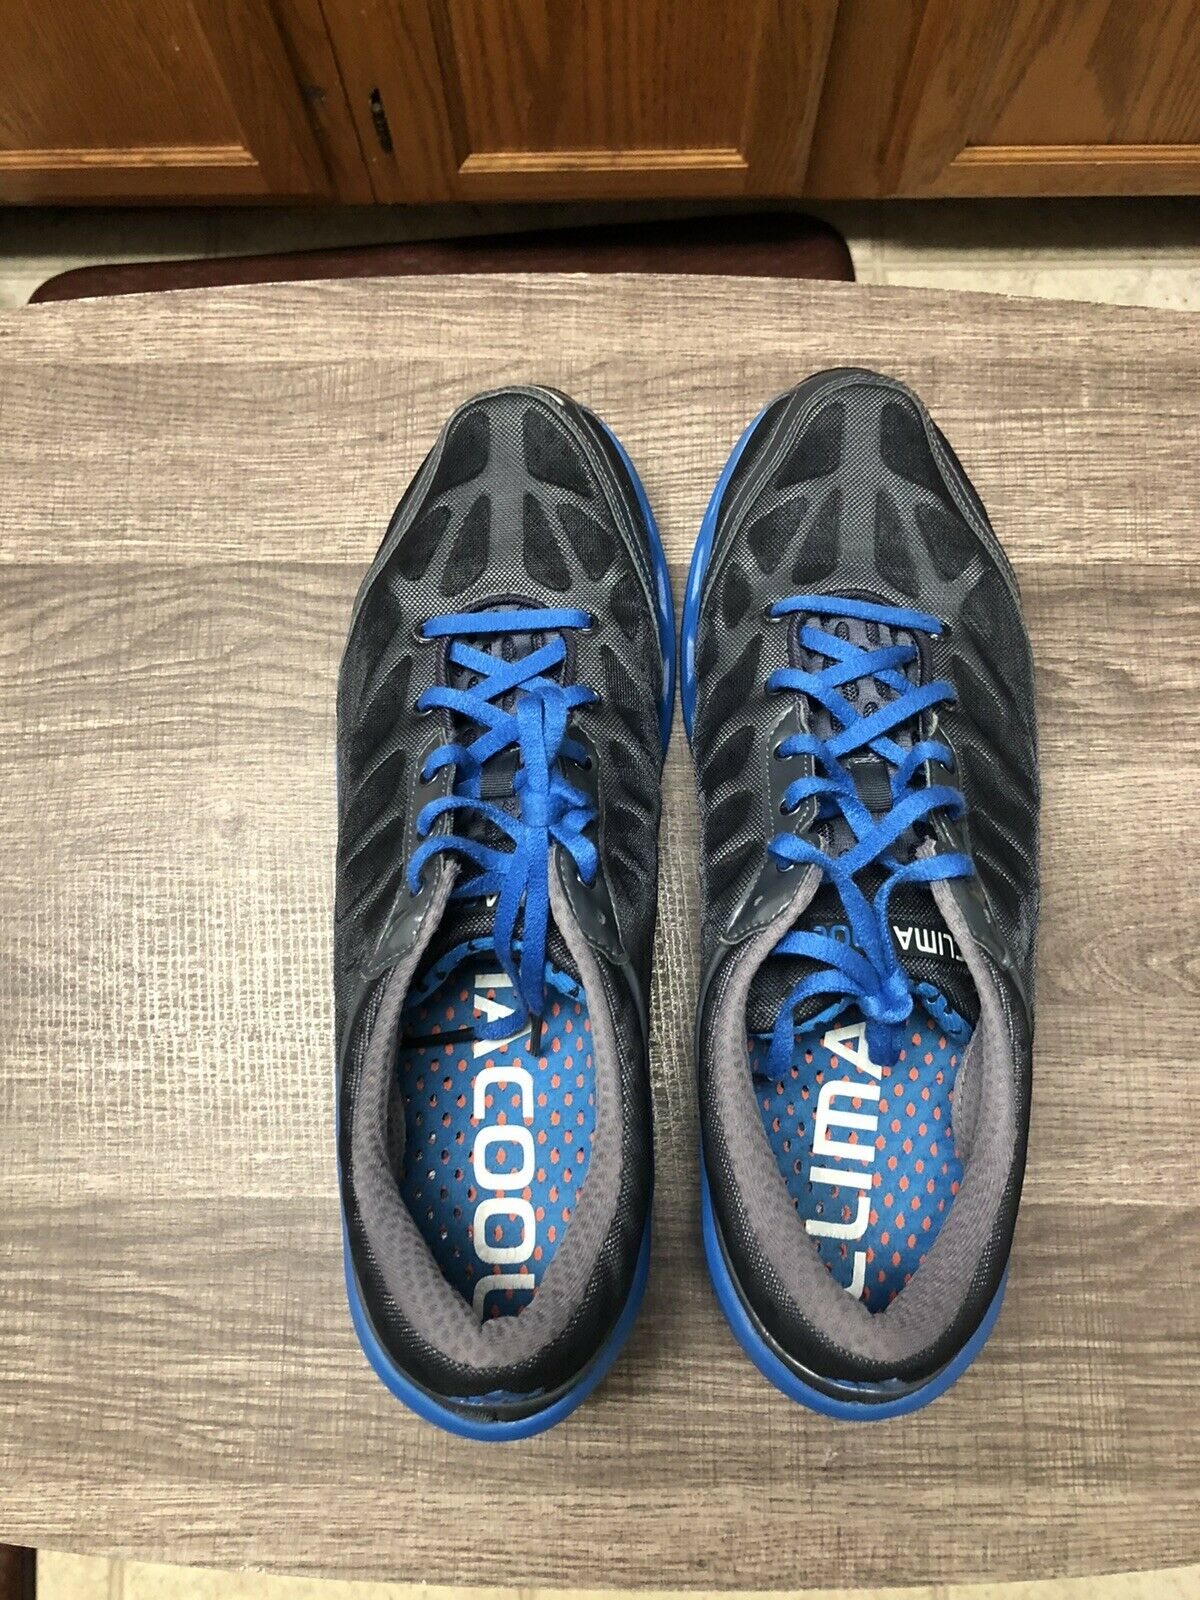 Adidas CC Climacool Seduction Running Sneaker '12 Hot… - Gem